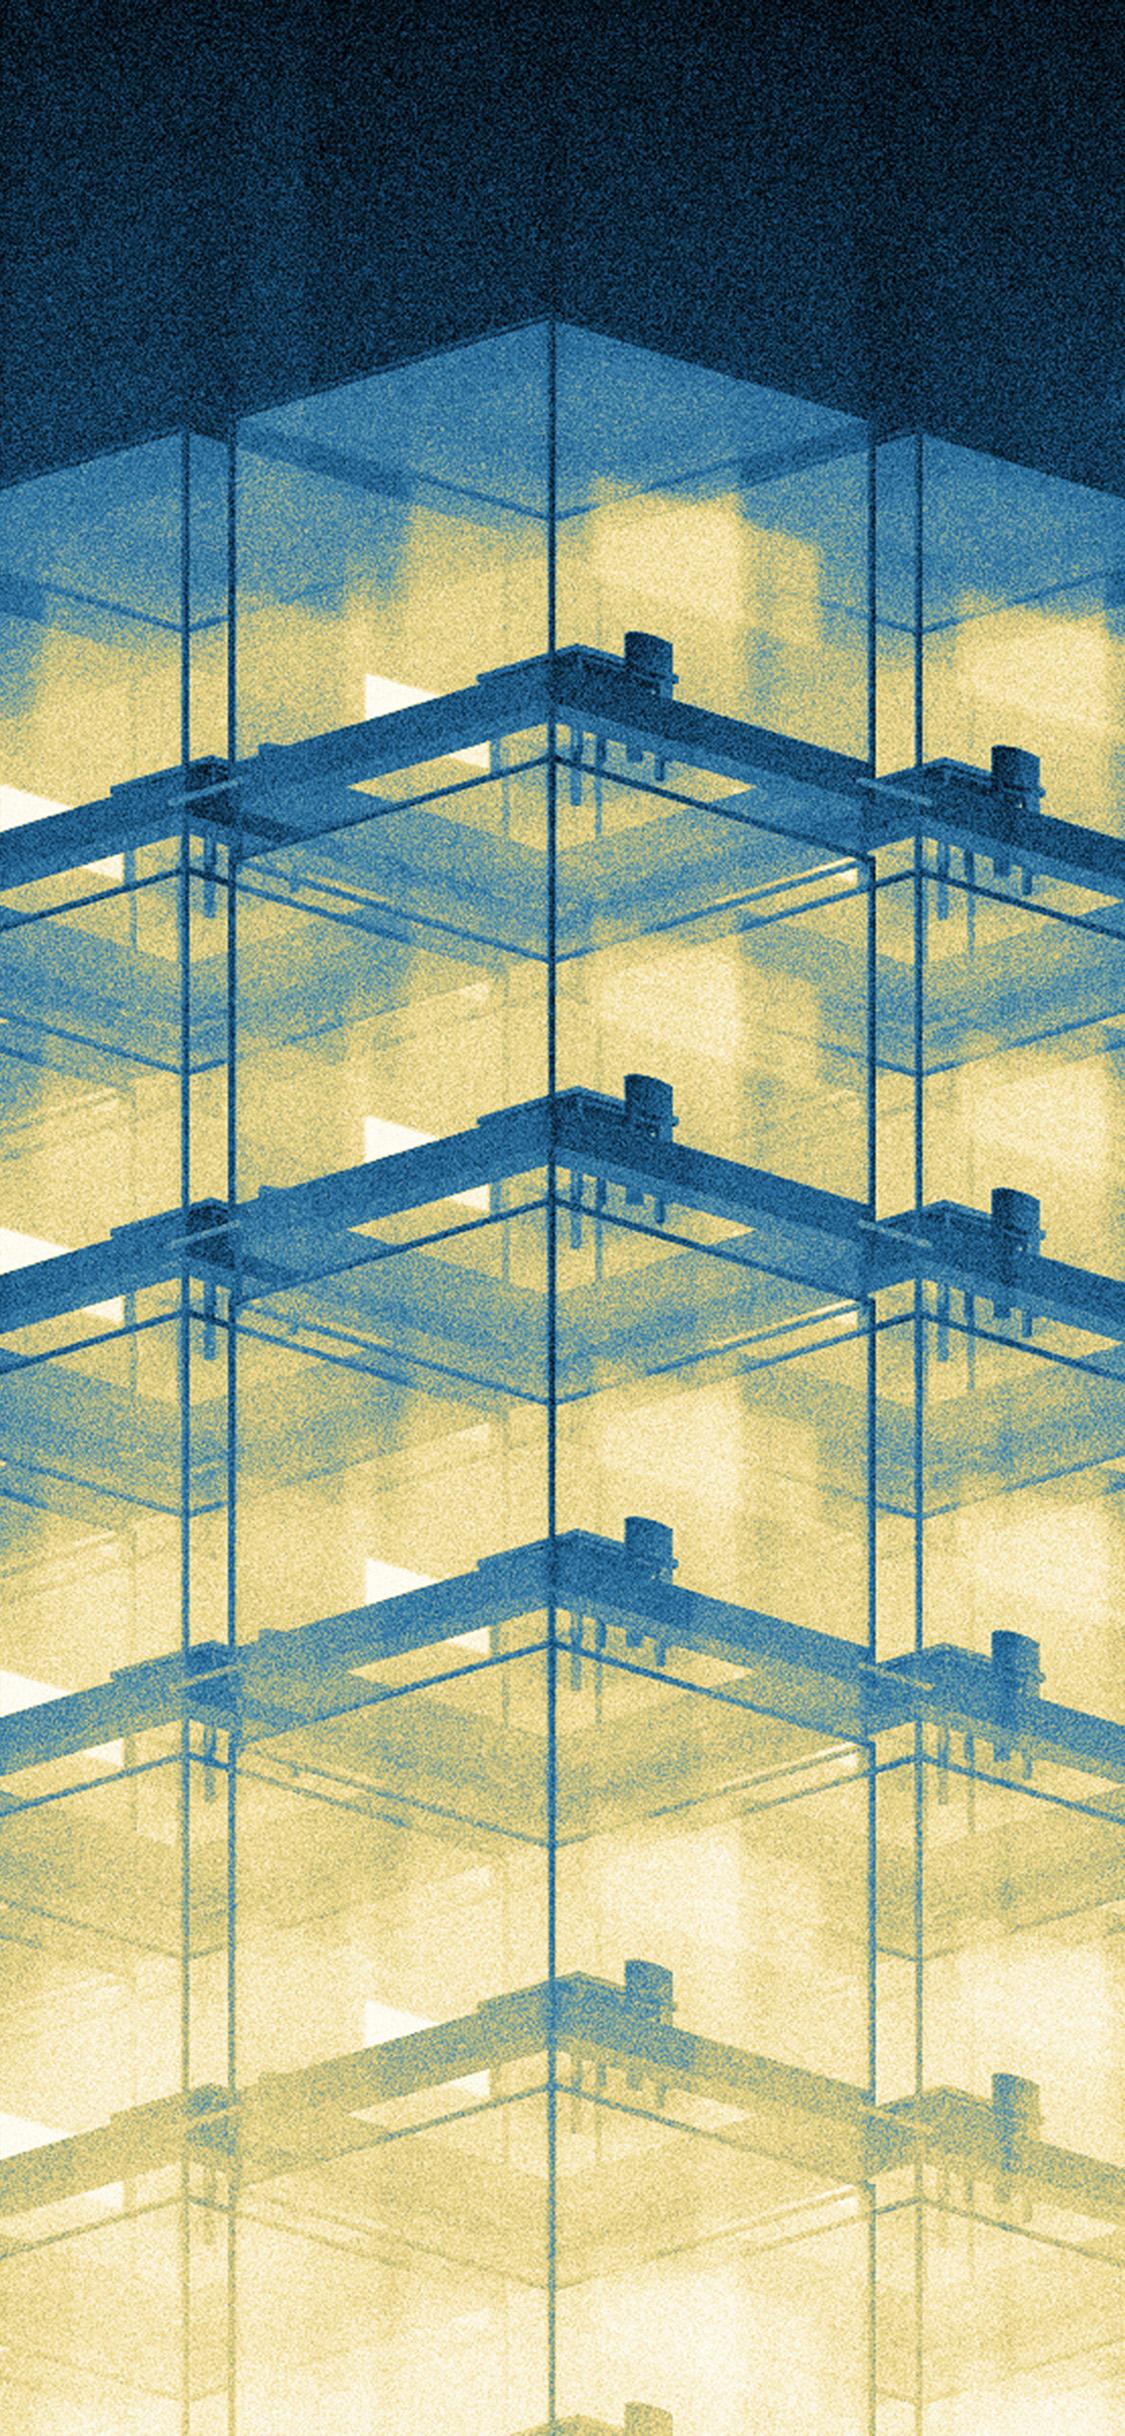 iPhonexpapers.com-Apple-iPhone-wallpaper-bk33-art-office-building-blue-illust